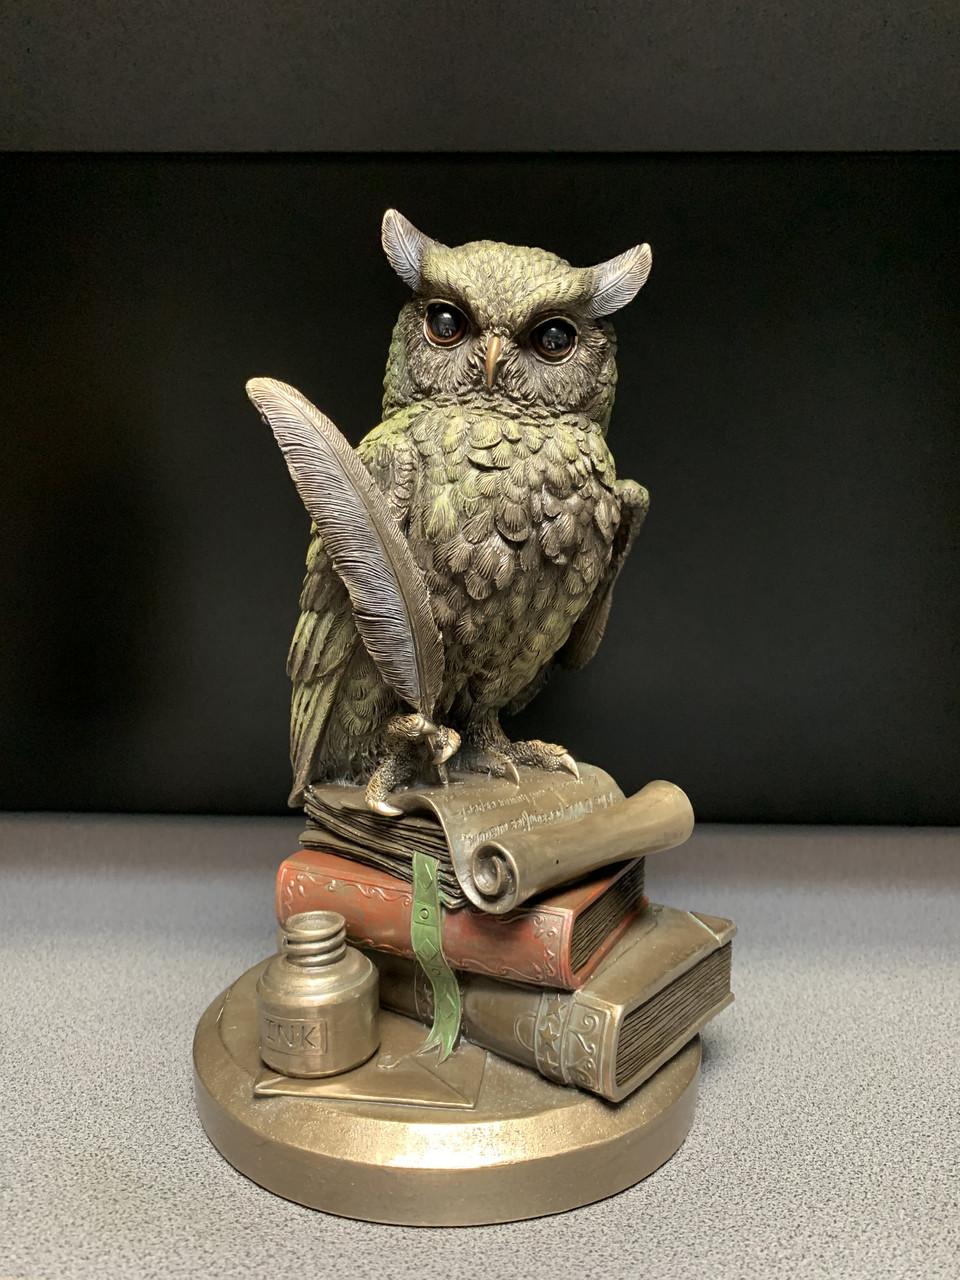 Статуэтка Сова на книгах с пером Veronese 23 см, символ мудрости